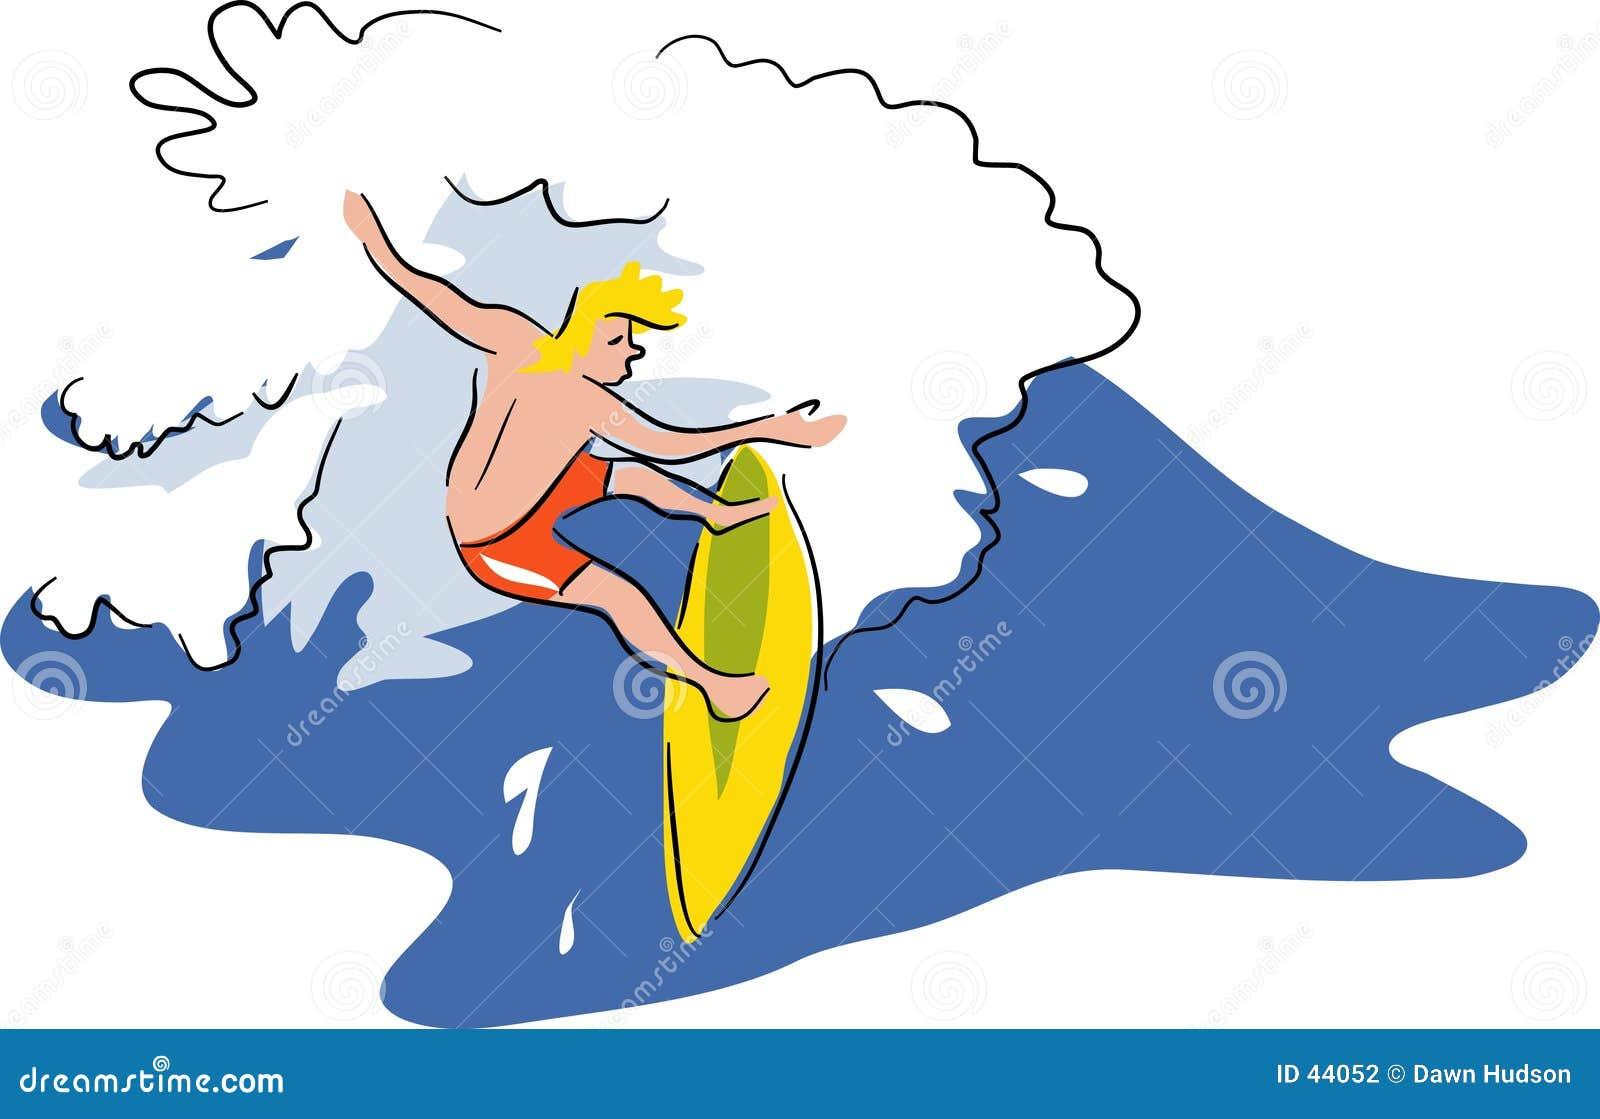 Praticare il surfing